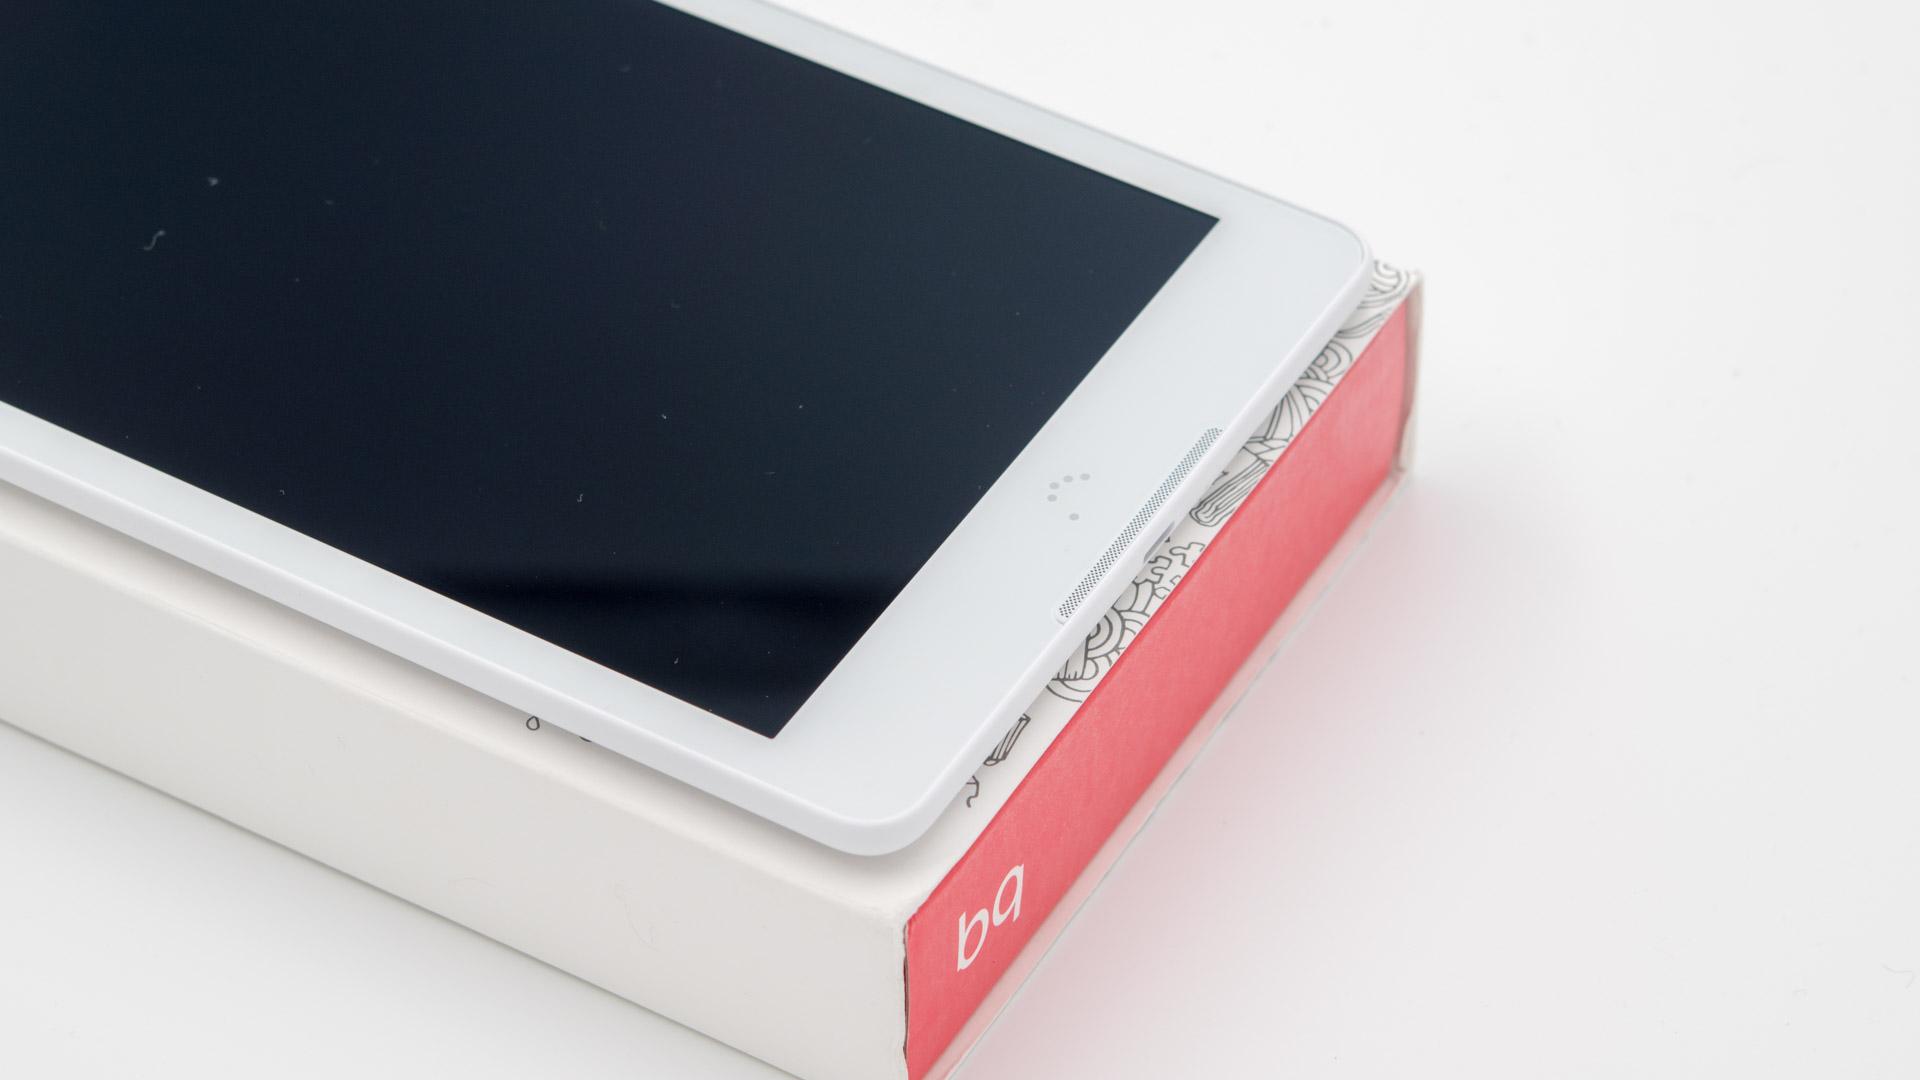 das bq aquaris m8 tablet im test techtest. Black Bedroom Furniture Sets. Home Design Ideas